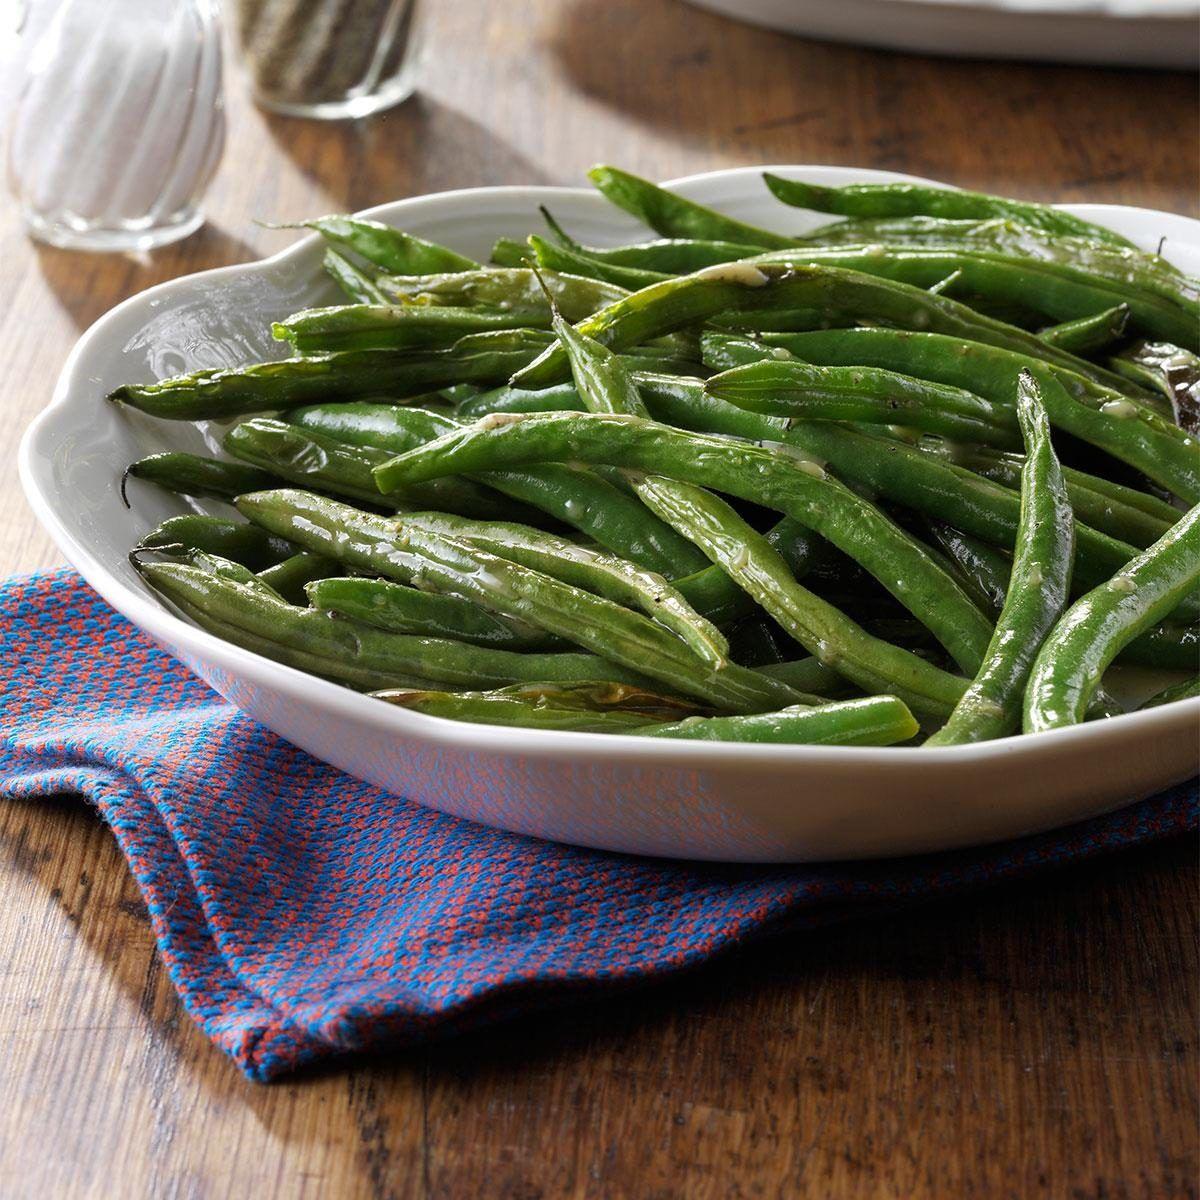 Roasted Green Bean Salad Recipe In 2020 Green Bean Salad Recipes Green Beans Bean Salad Recipes